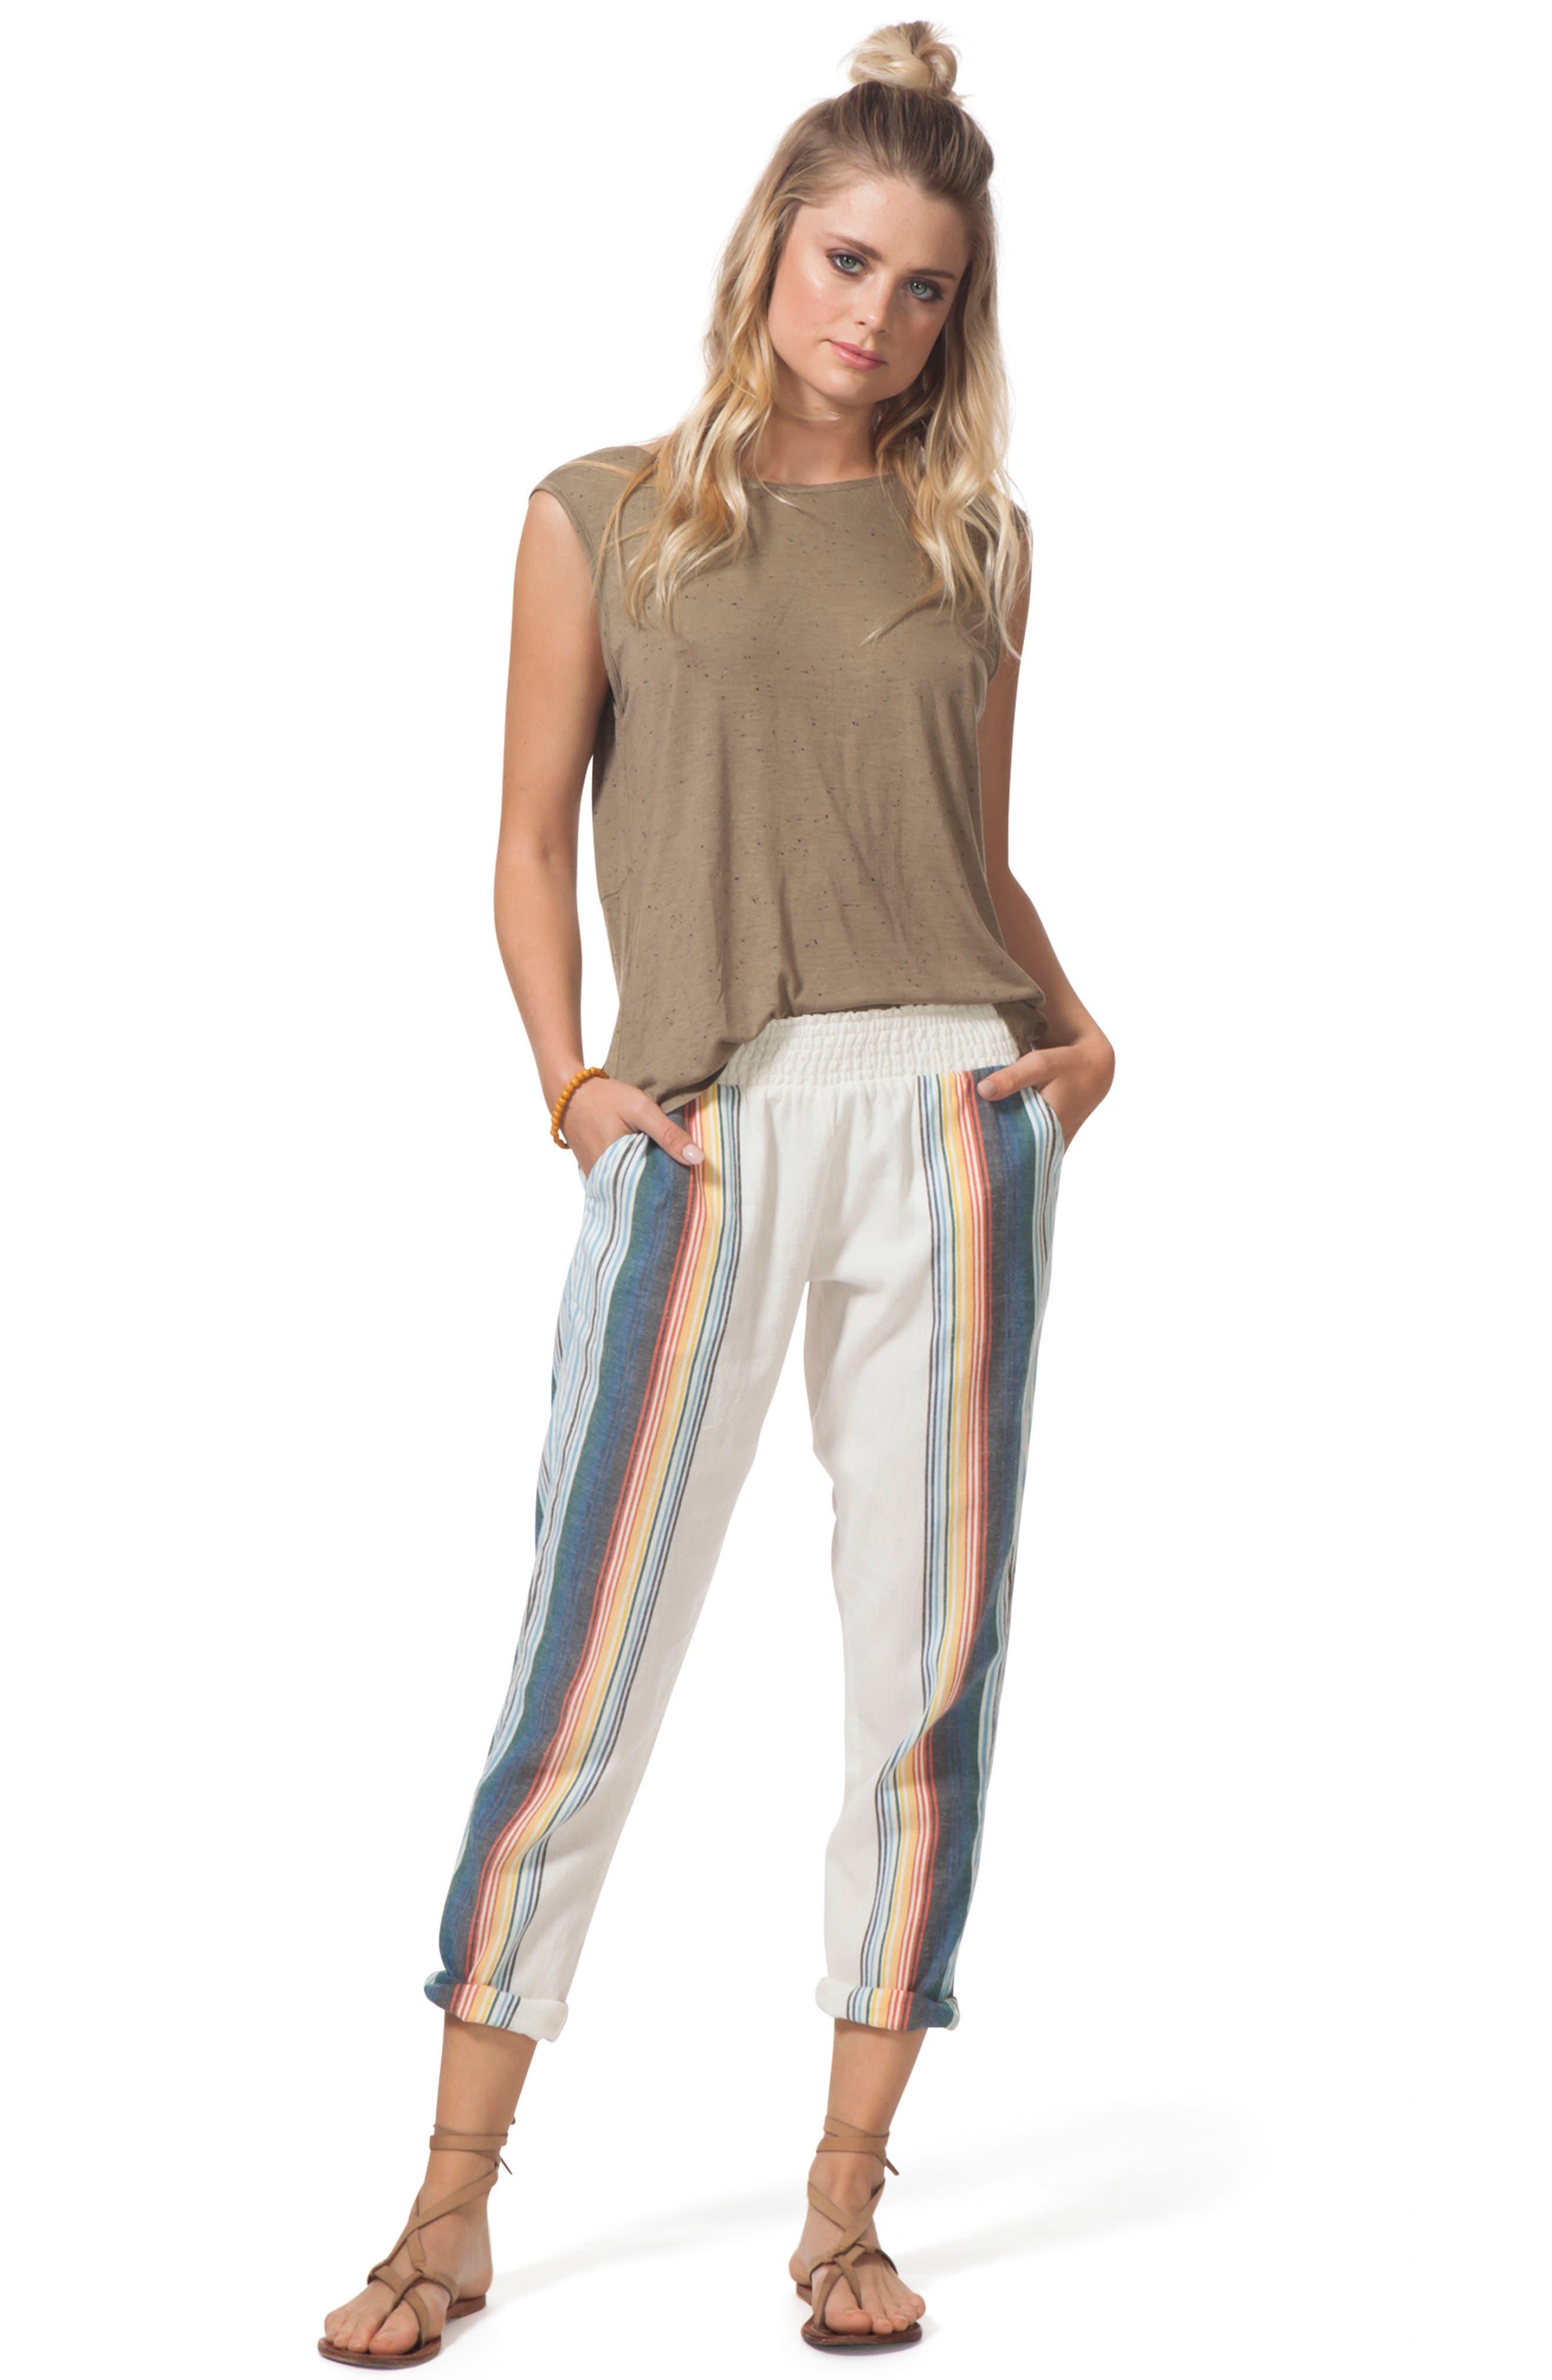 Beach Bazaar Pants,                             Alternate thumbnail 4, color,                             VANILLA